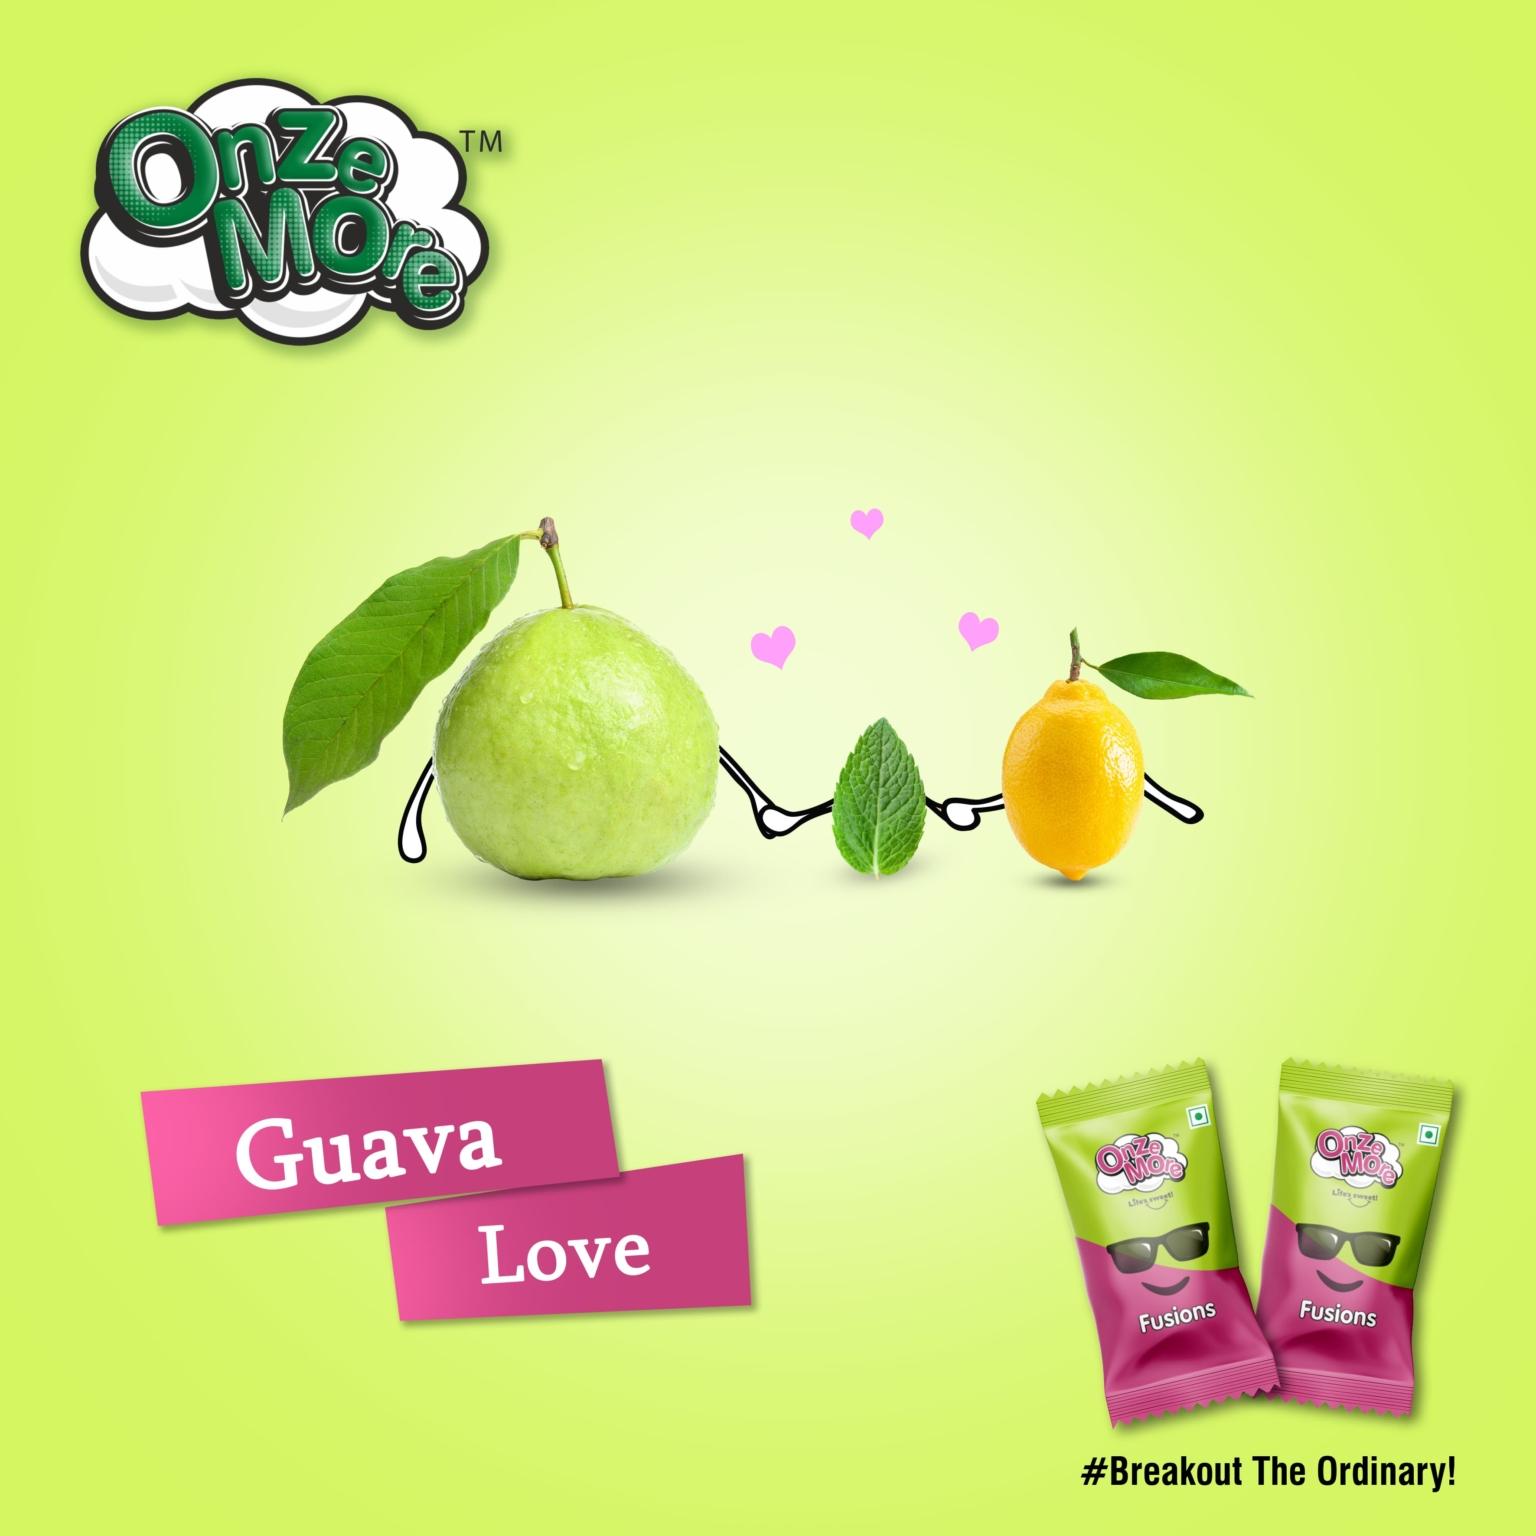 Guava Love - Season Greetings 500